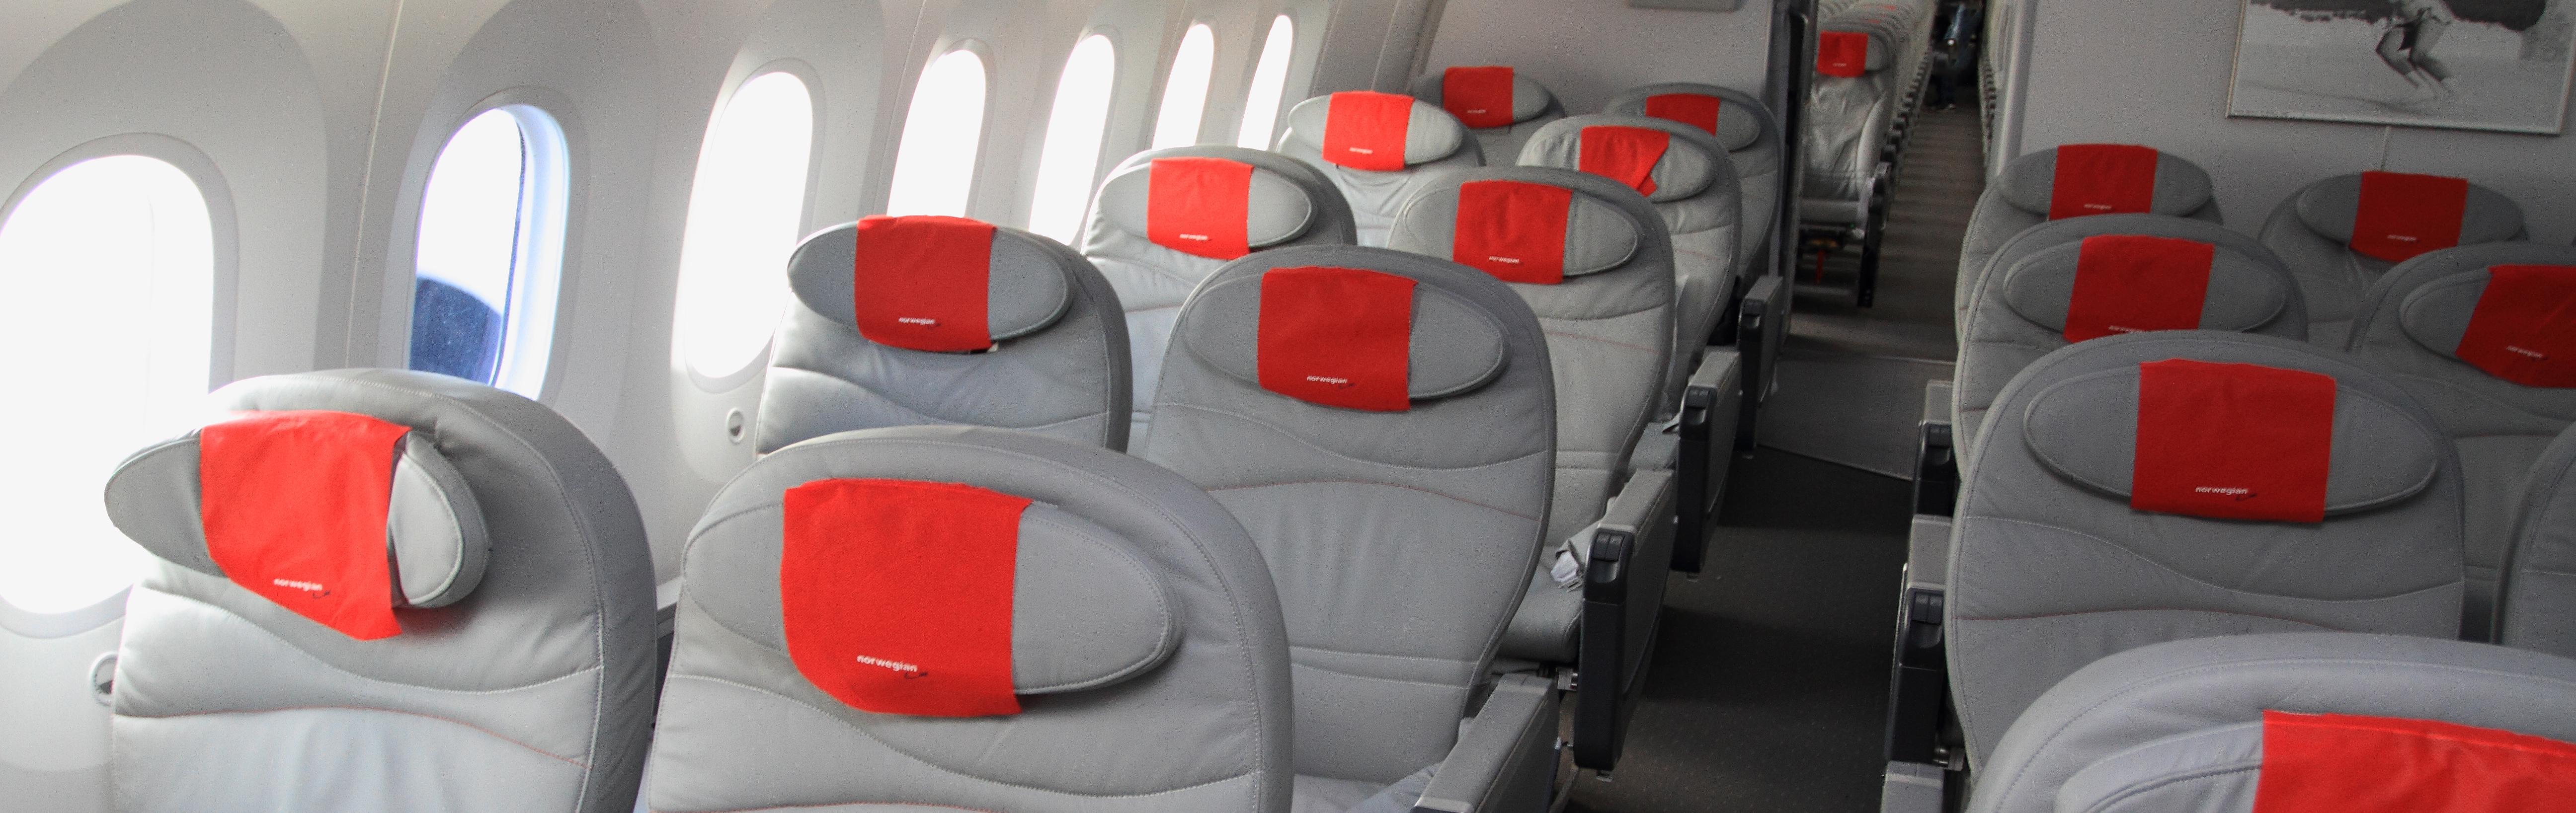 norwegian air online check in